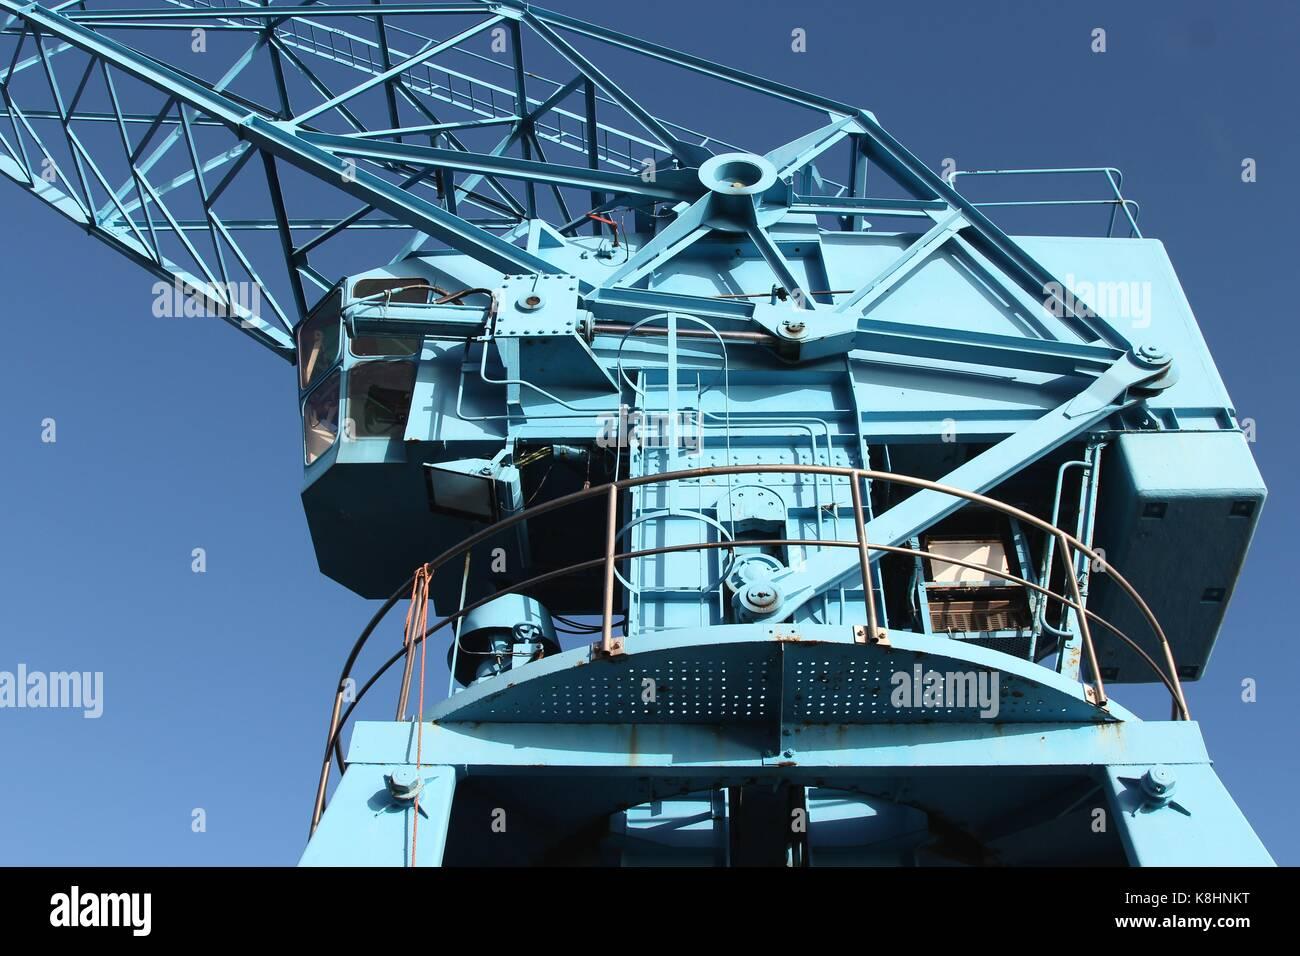 industrial crane against blue sky - Stock Image